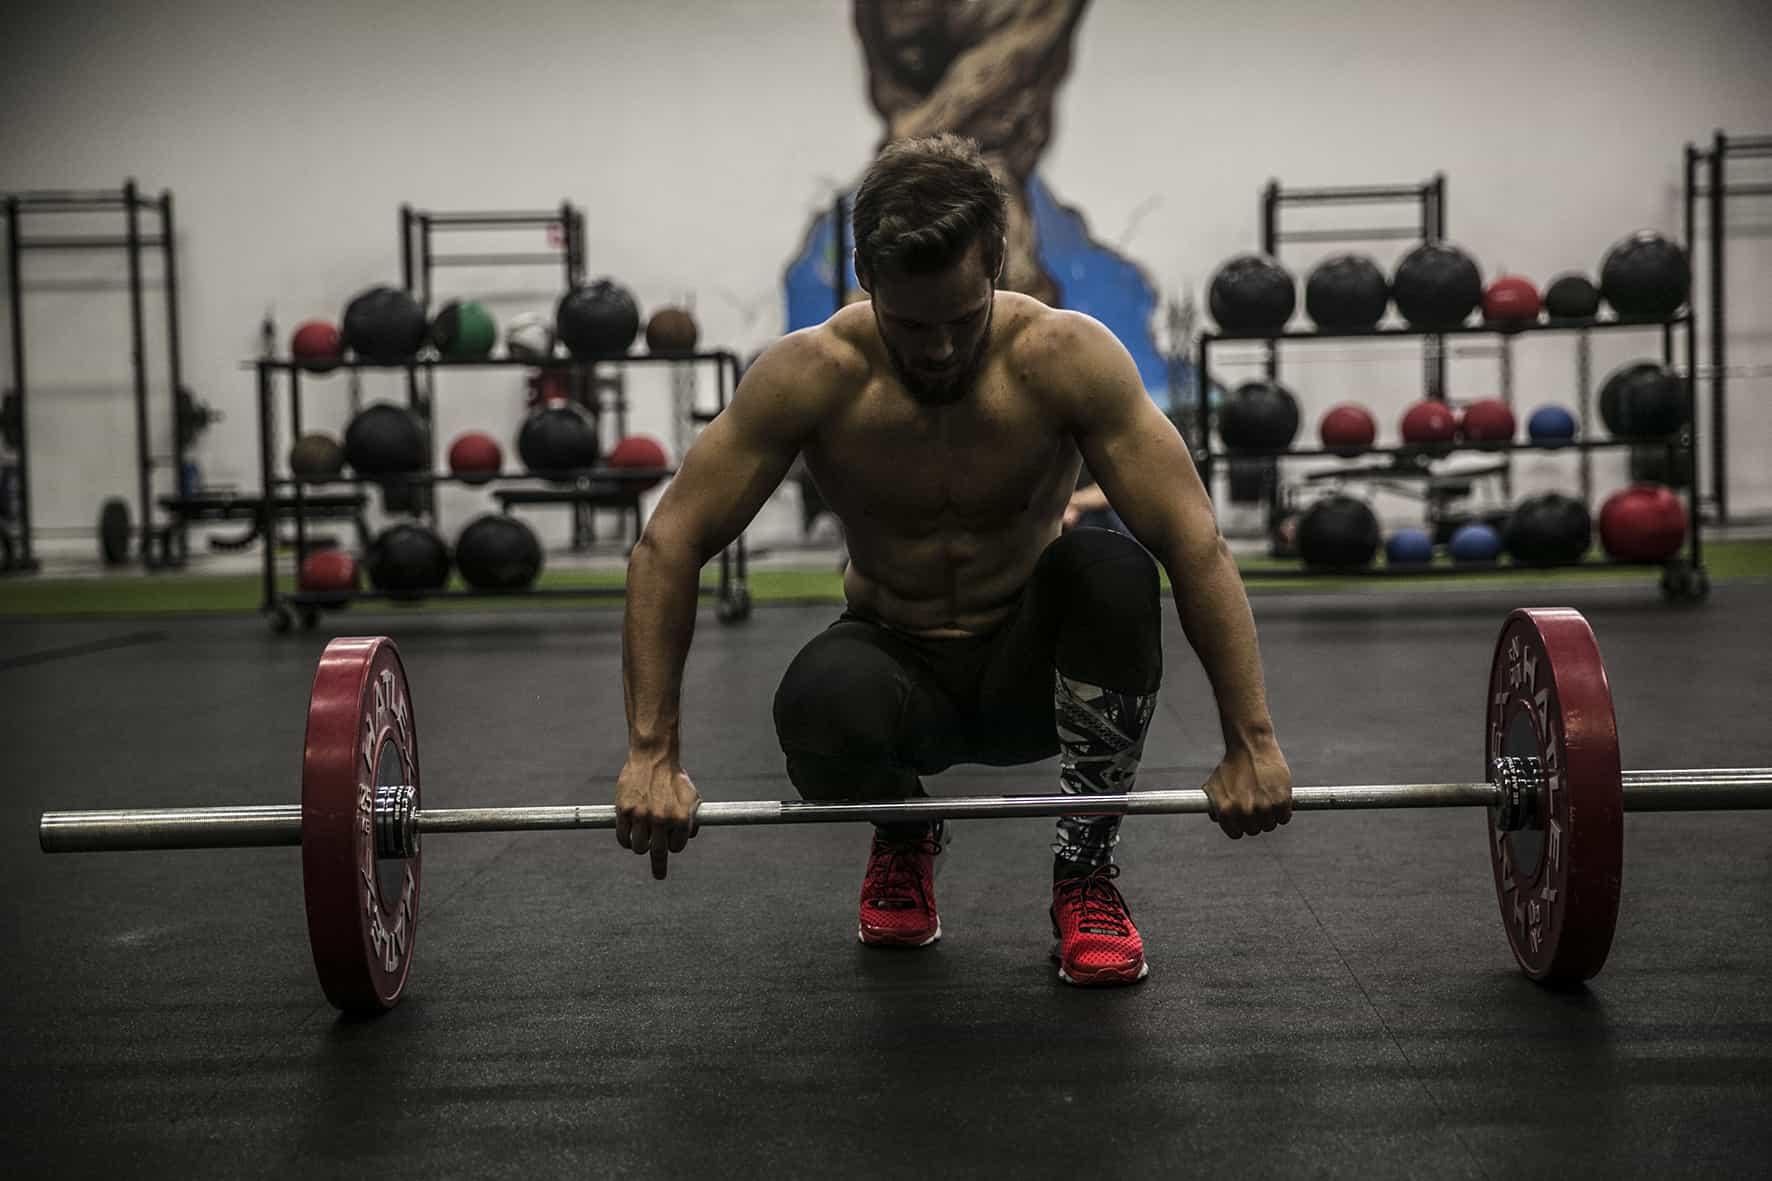 kako frekvenca vpliva na pridobivanje mišične mase